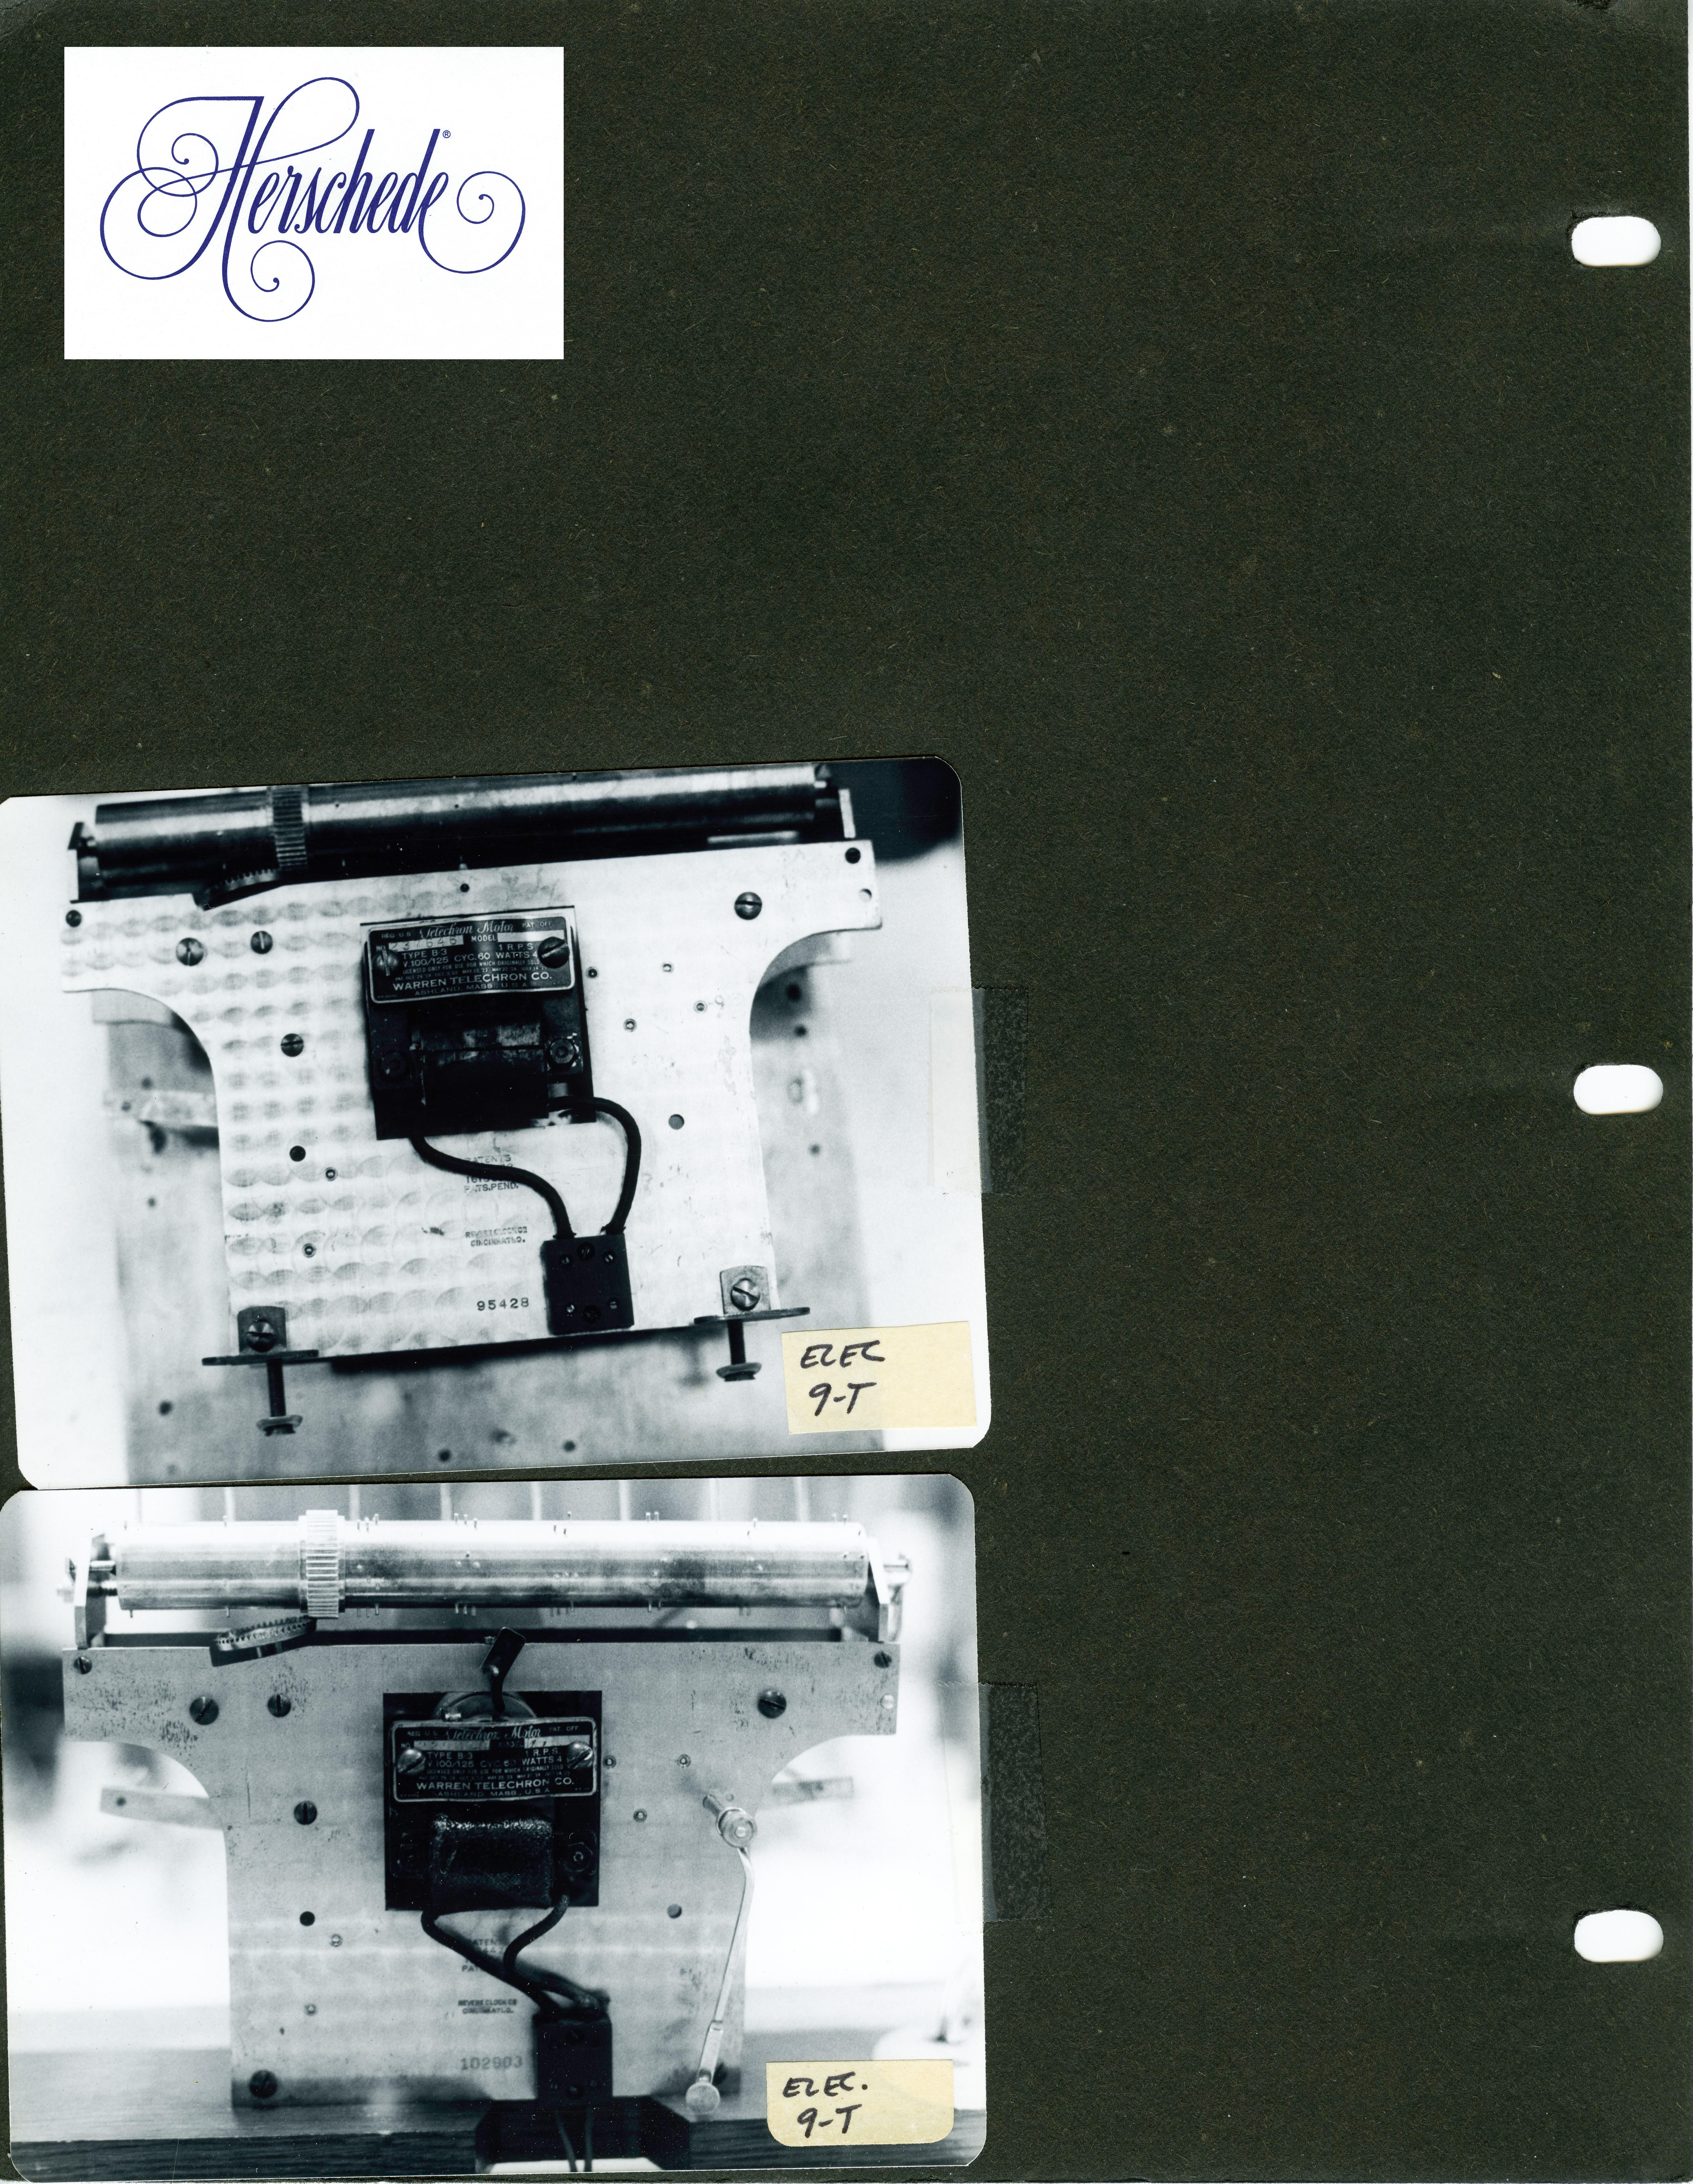 her-9-tube-electric-mov-pics2-web.jpg